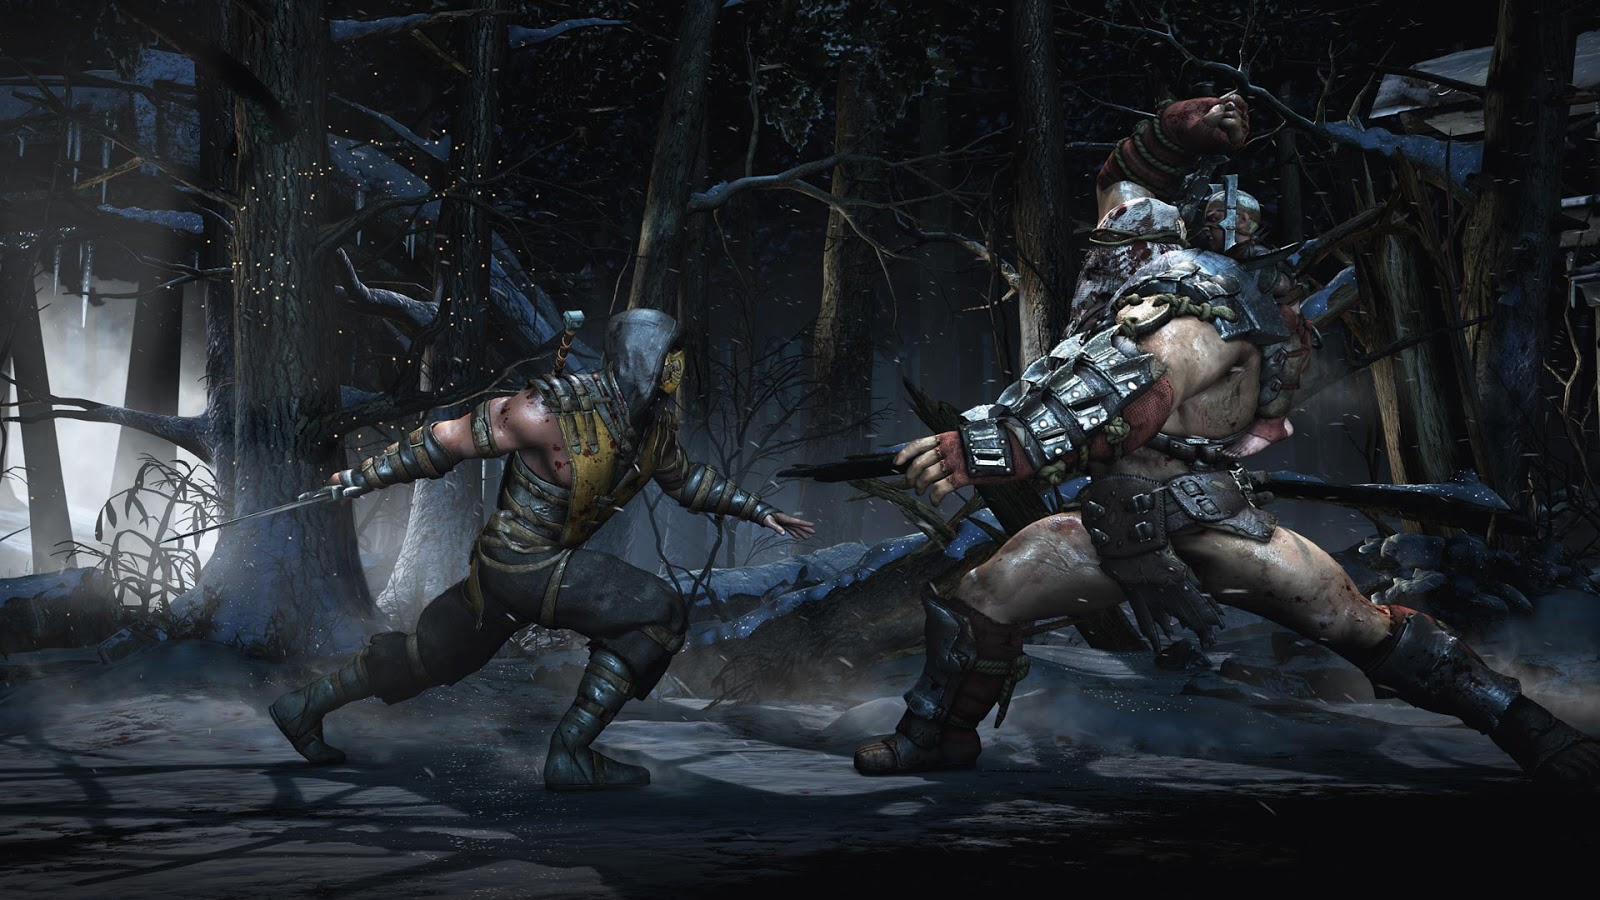 Mortal Kombat X Online - UNSTOPPABLE JASON! - YouTube